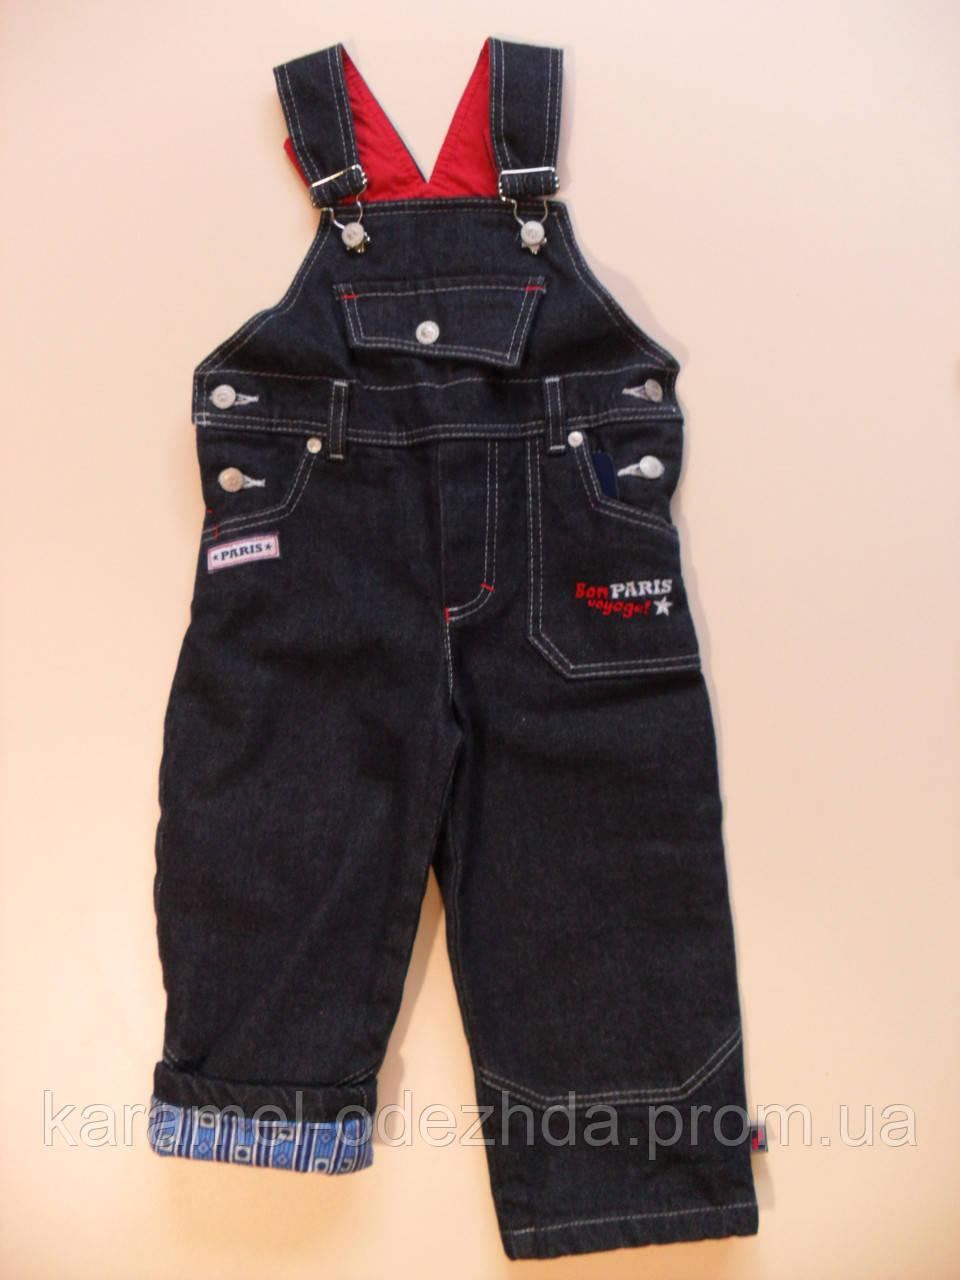 джинсы b.s.k denim